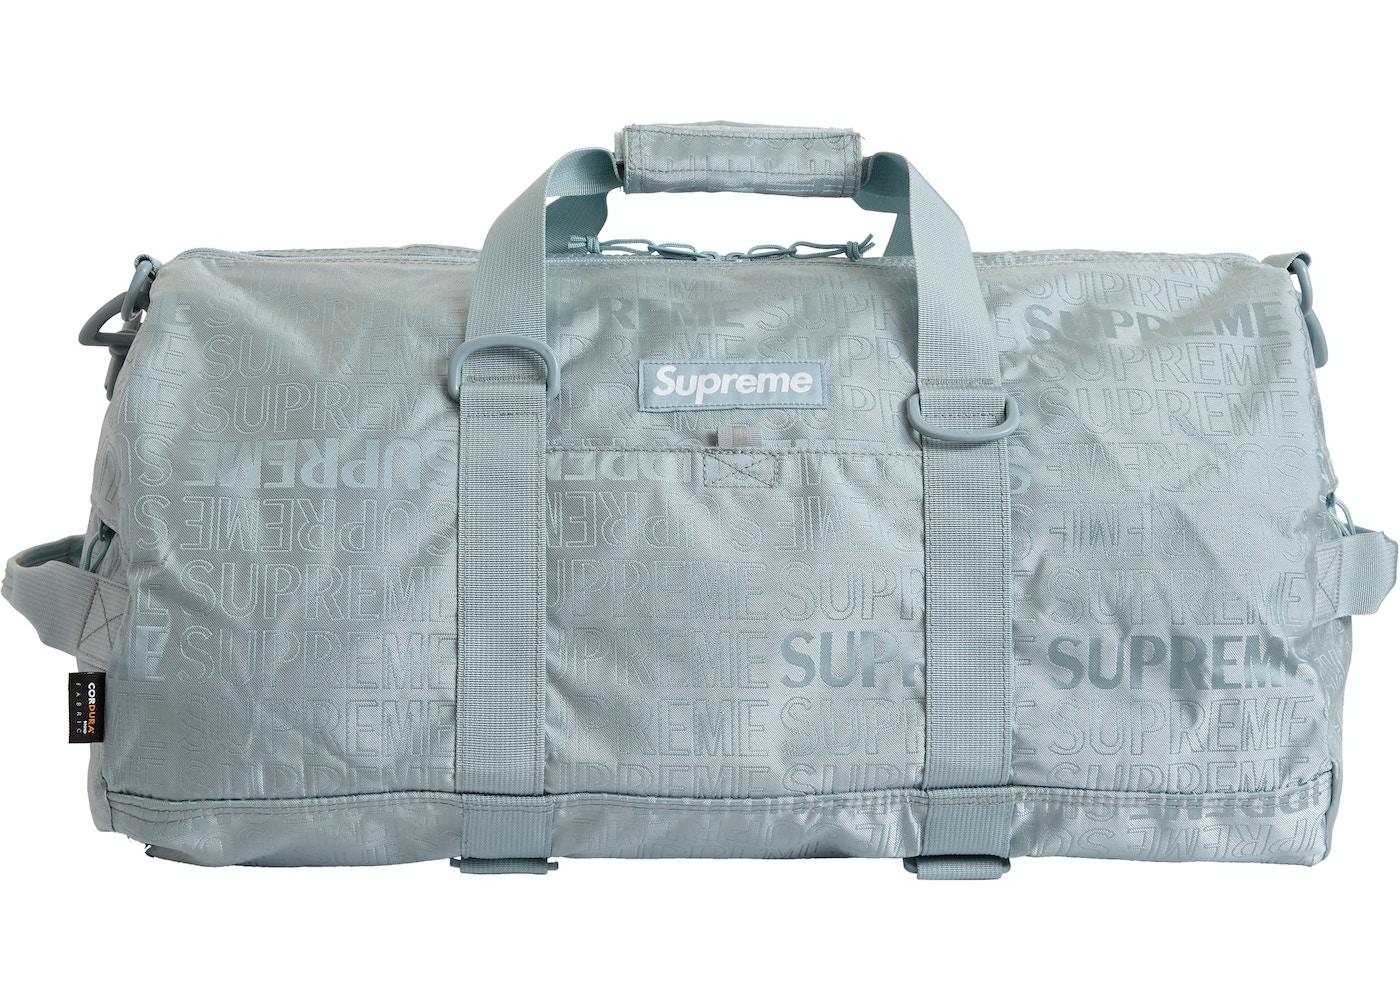 36e7c2210 Supreme Duffle Bag (SS19) Light Blue - SS19